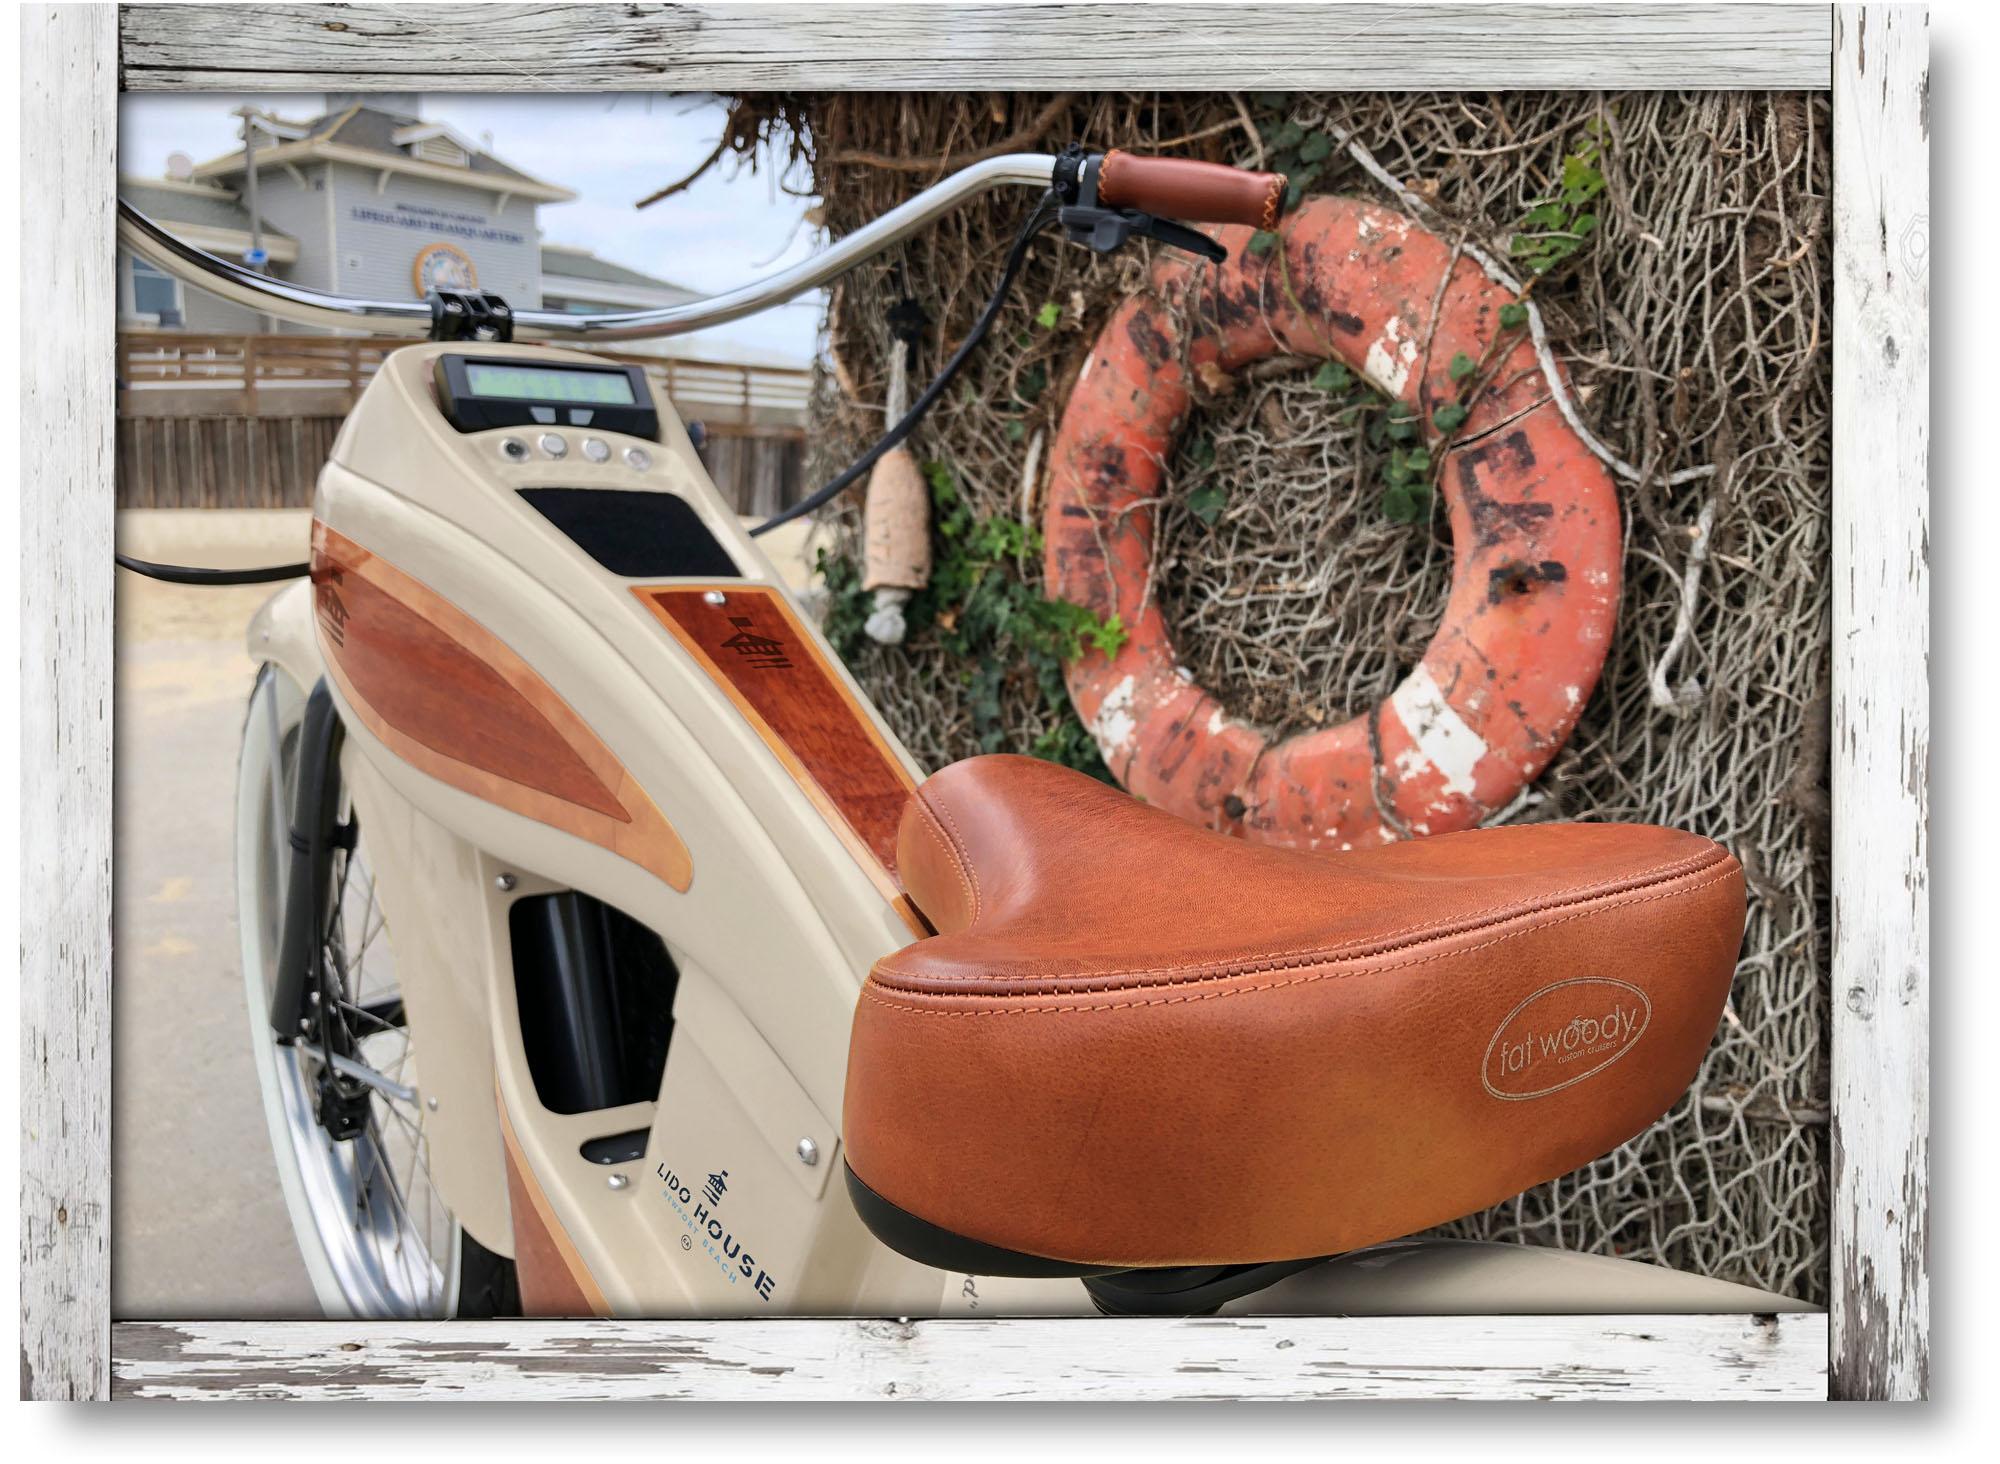 Fat Woody Beach Cruiser 031.jpg